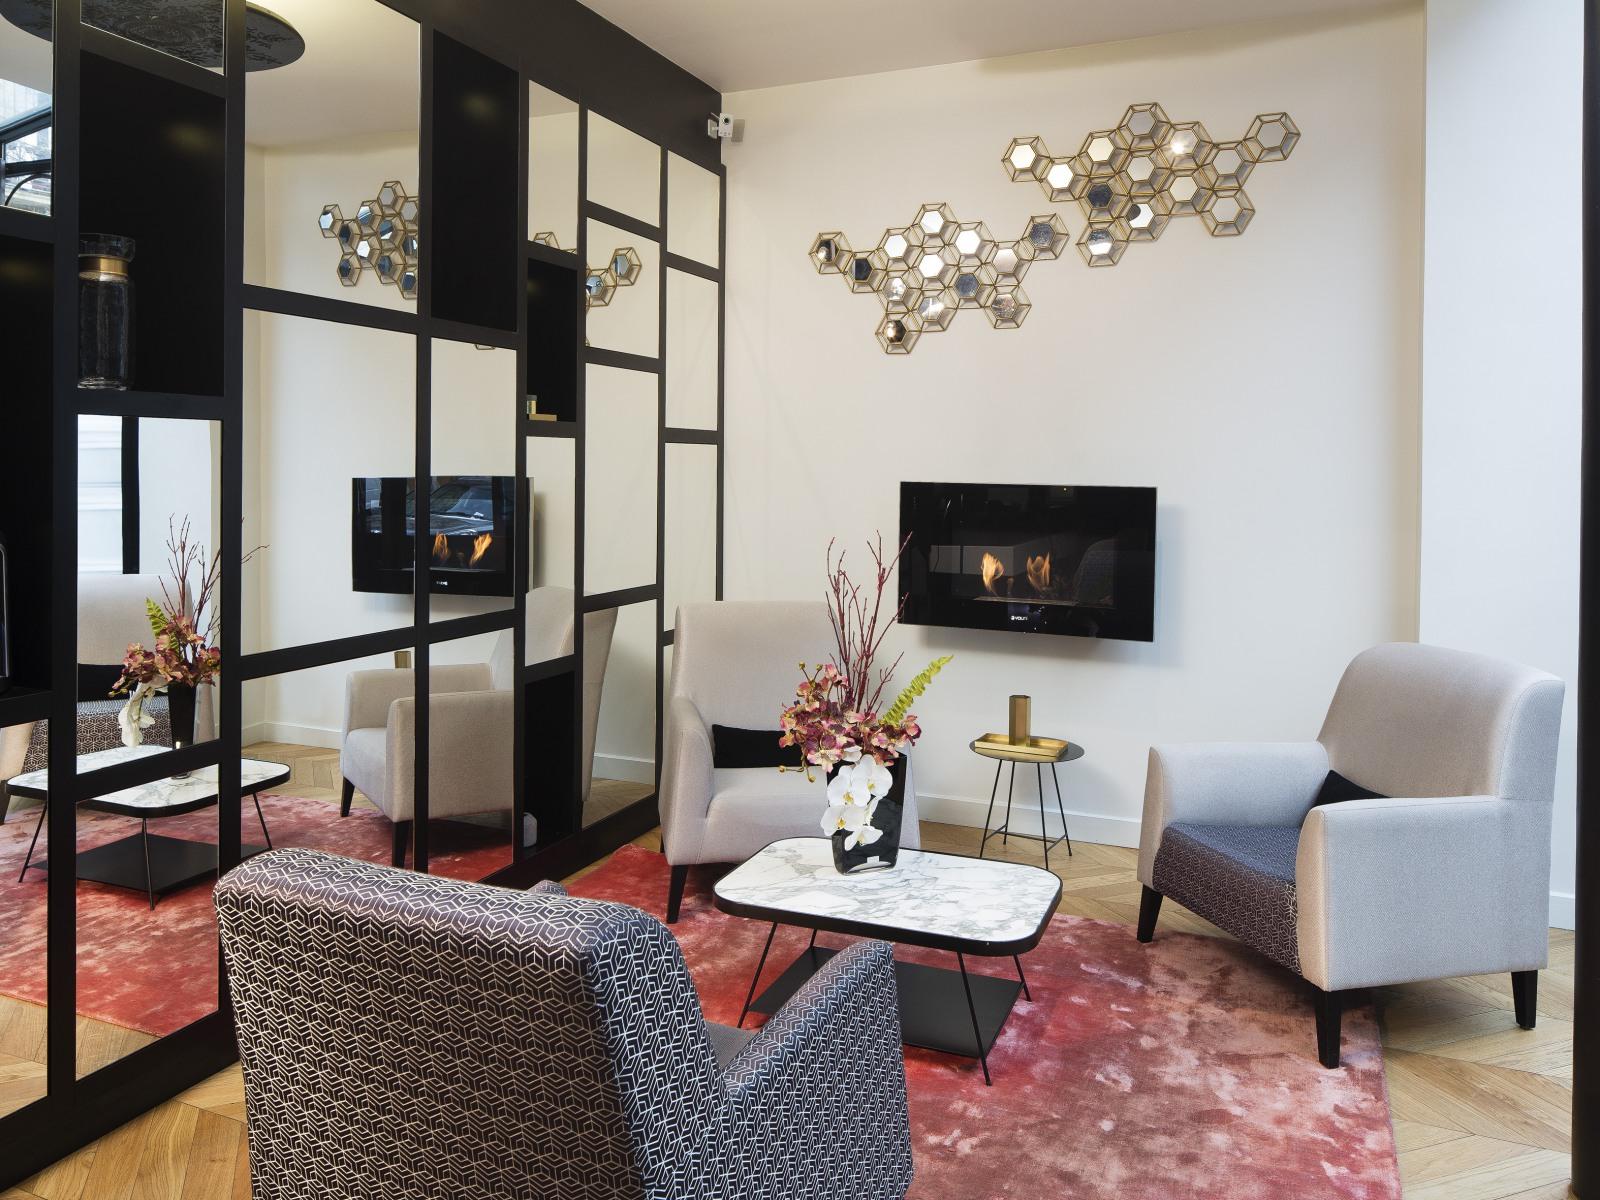 Hotel Le Relais du Marais Paris 3 star hotel